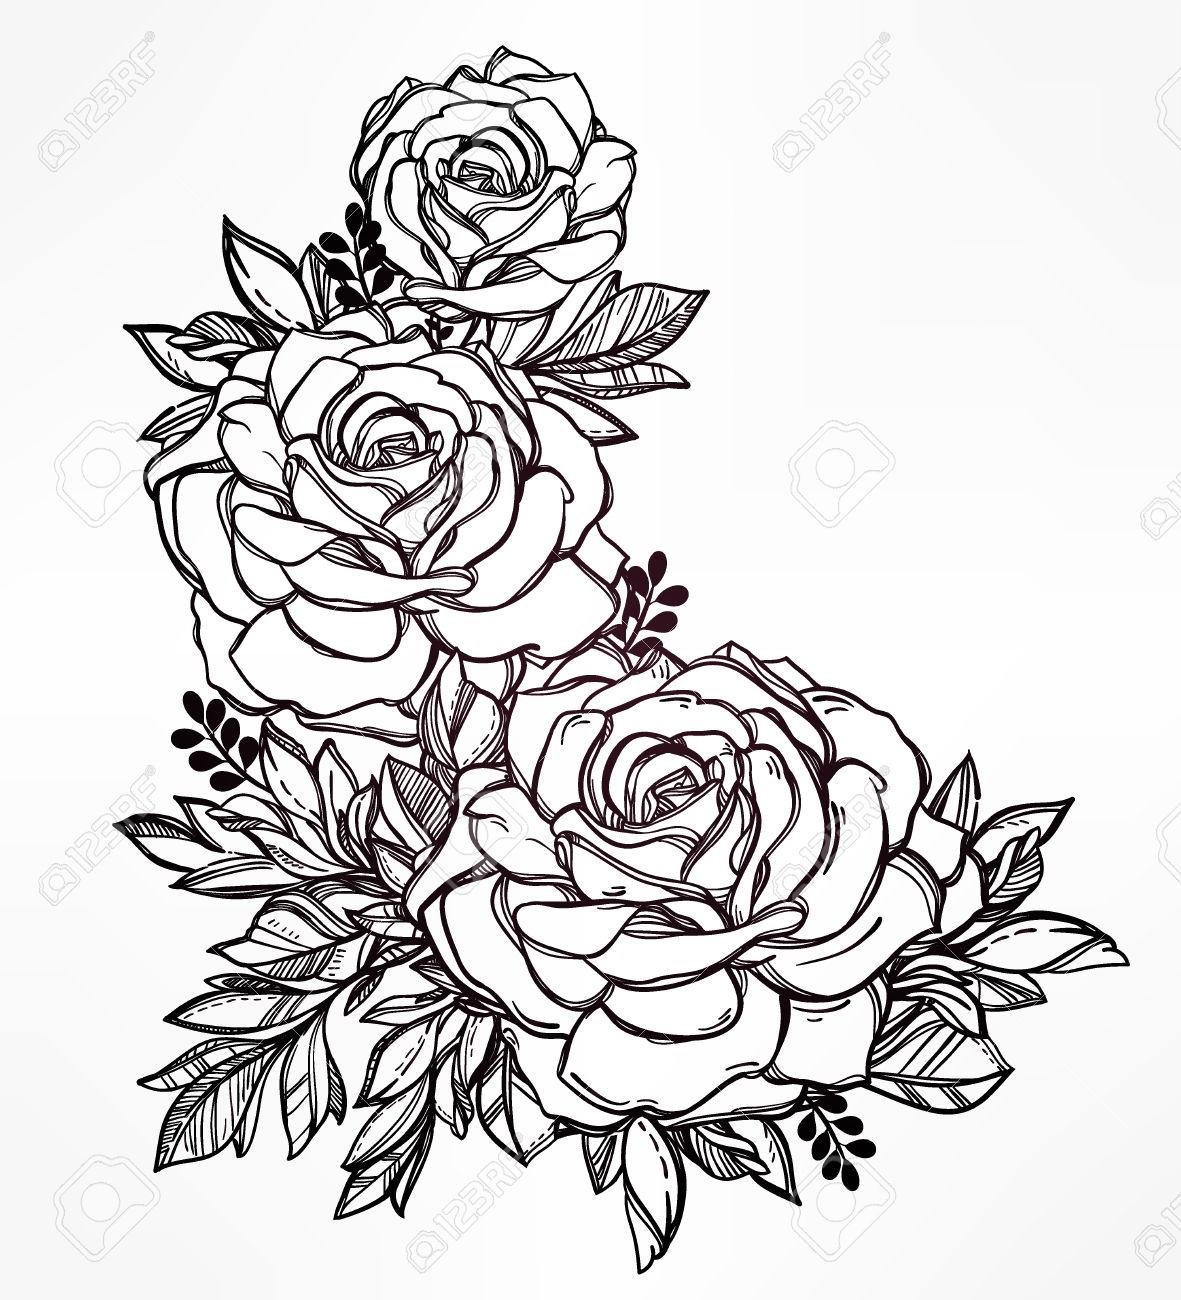 Drawn rose different flower With Vintage Vintage  flower